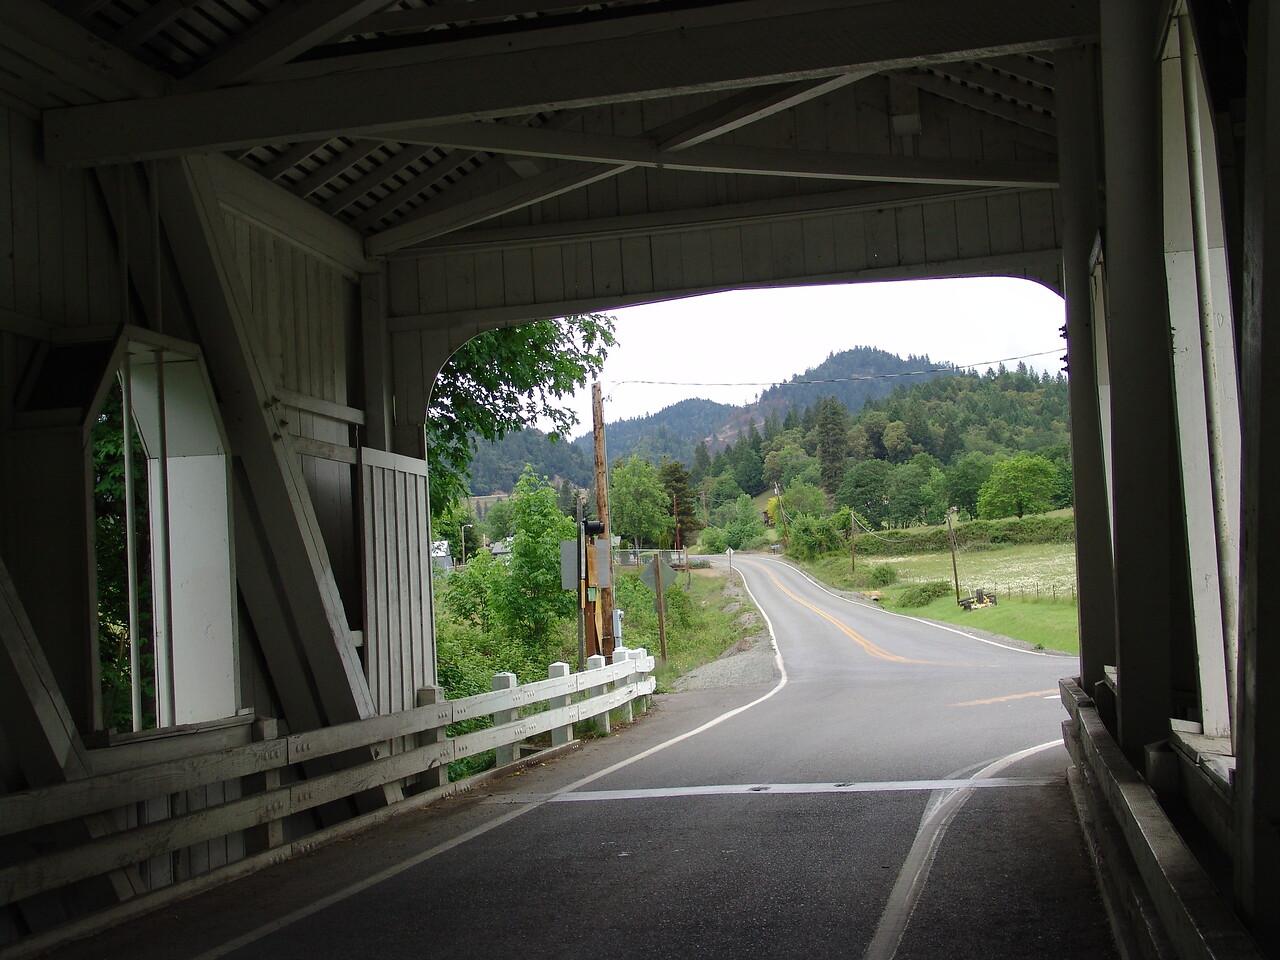 INSIDE GRAVE CREEK COVERD BRIDGE NEAR GRANTS PASS